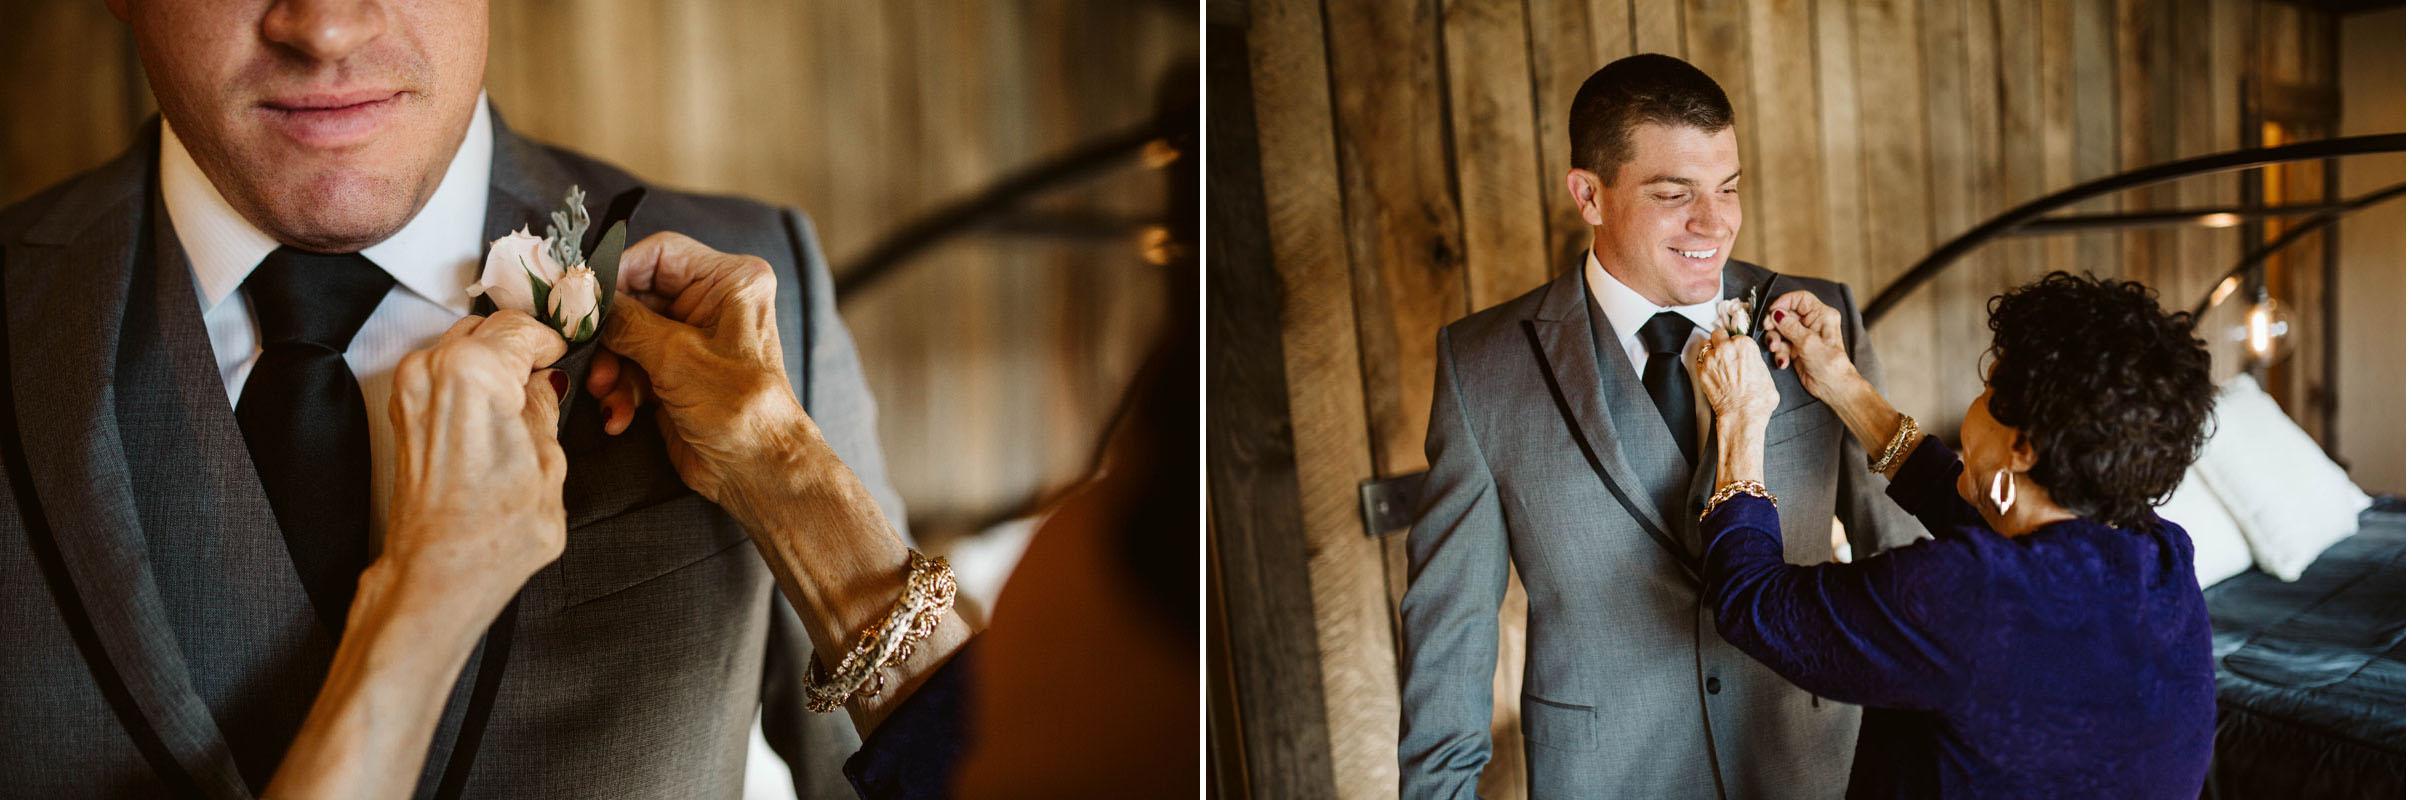 intimate-elopment-blue-ridge-georgia-north-georgia-wedding-photographers (18).jpg